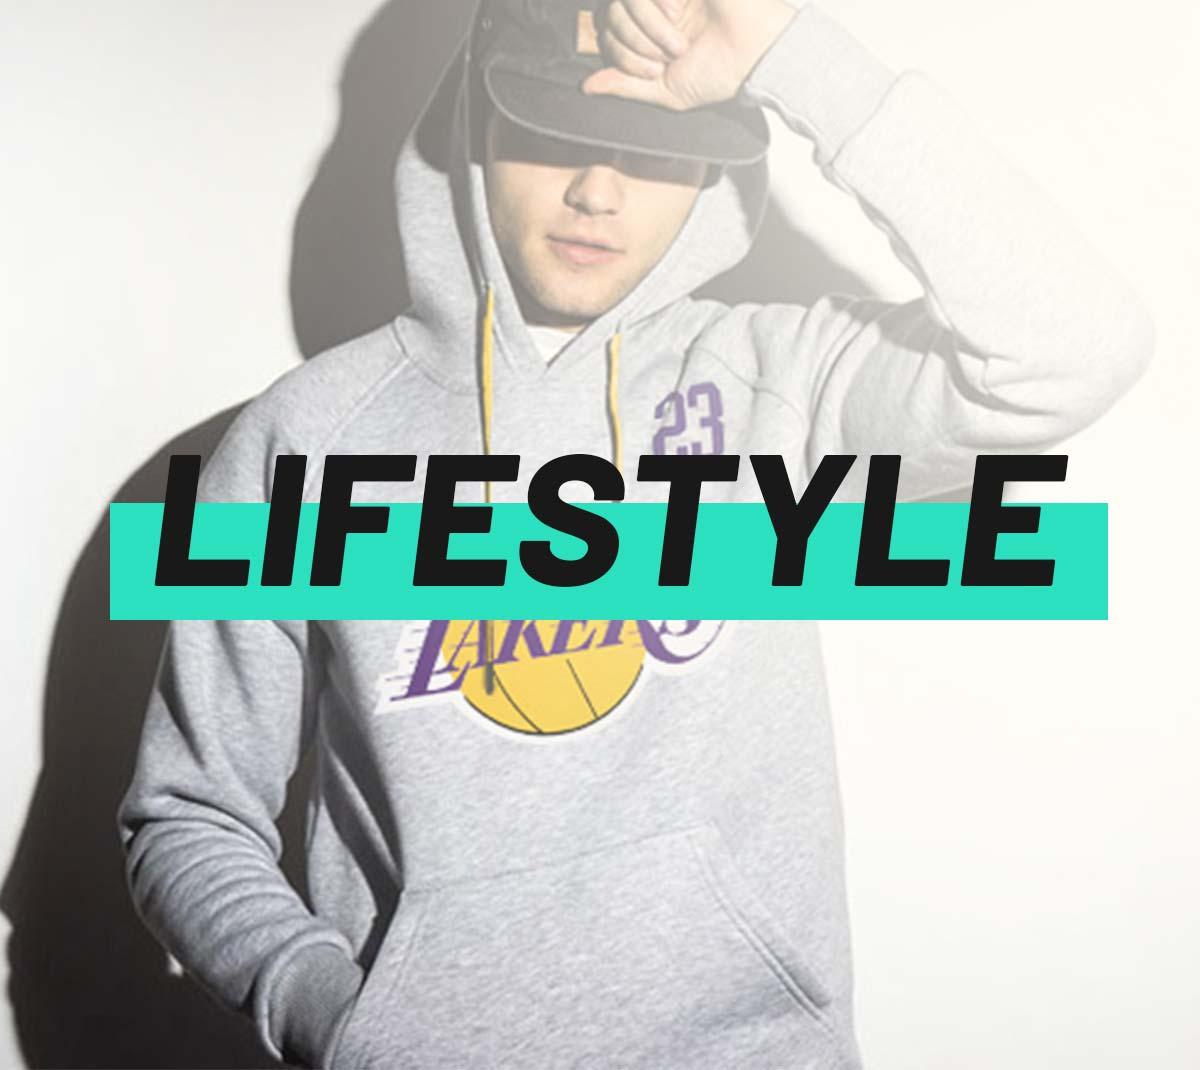 Univers Lifestyle